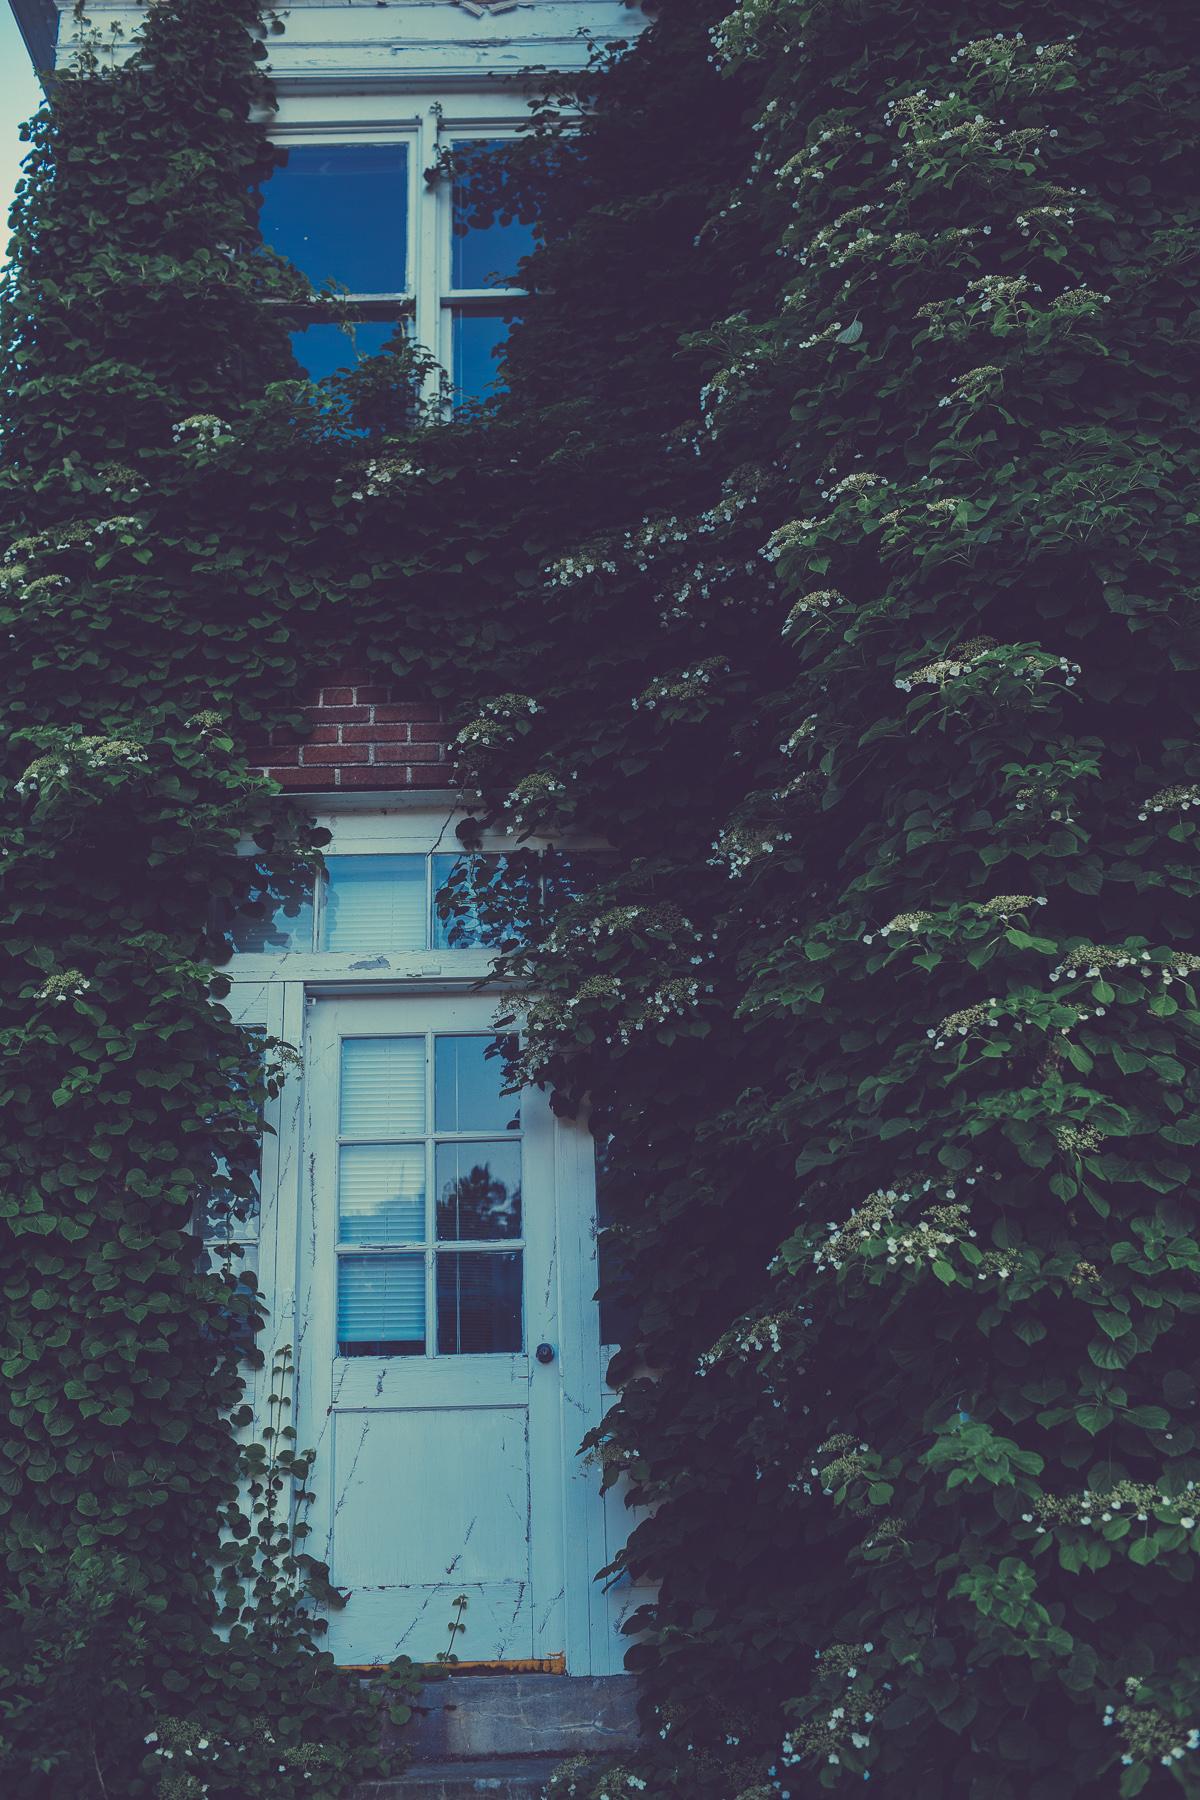 Lydia_Nihart_At_The_Outing_Lodge_Stillwater_Minnesota_By_Photographer_Joe_Lemke_027.JPG